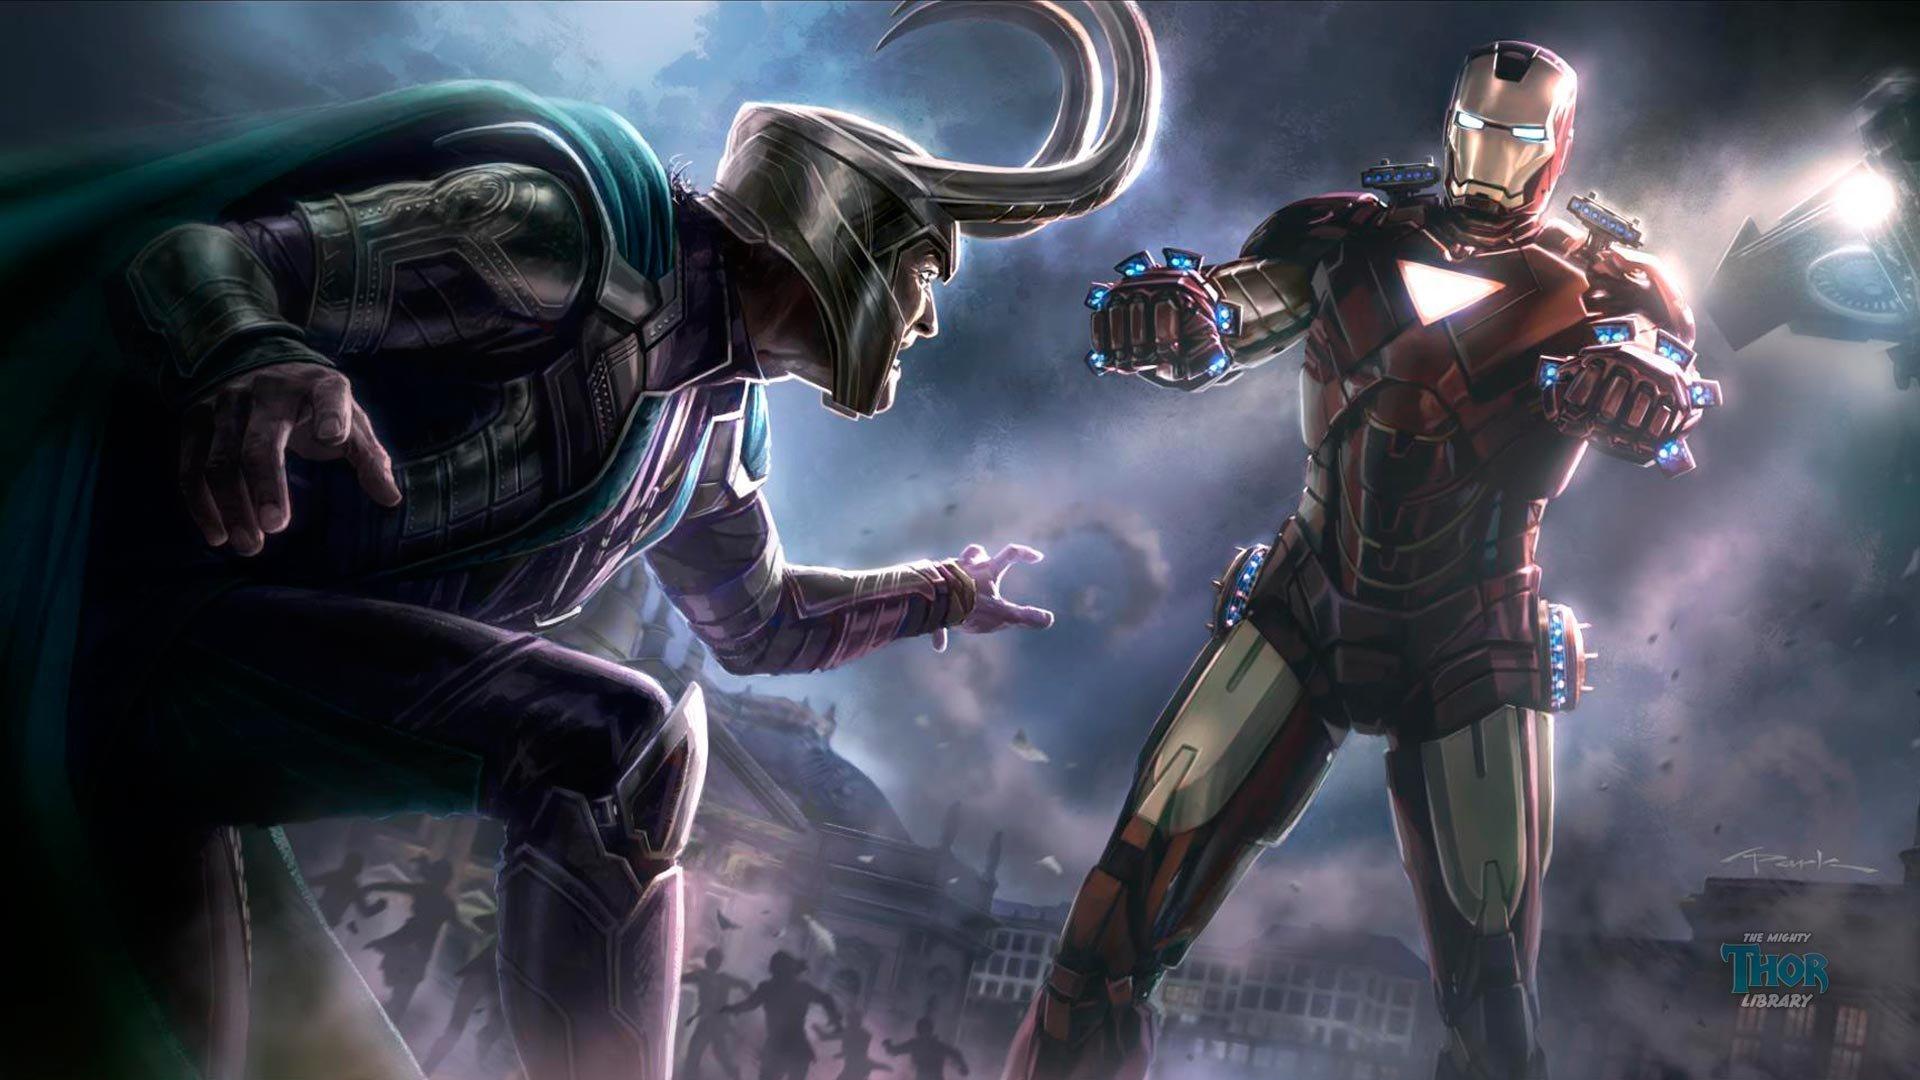 Avengers Loki armored suit